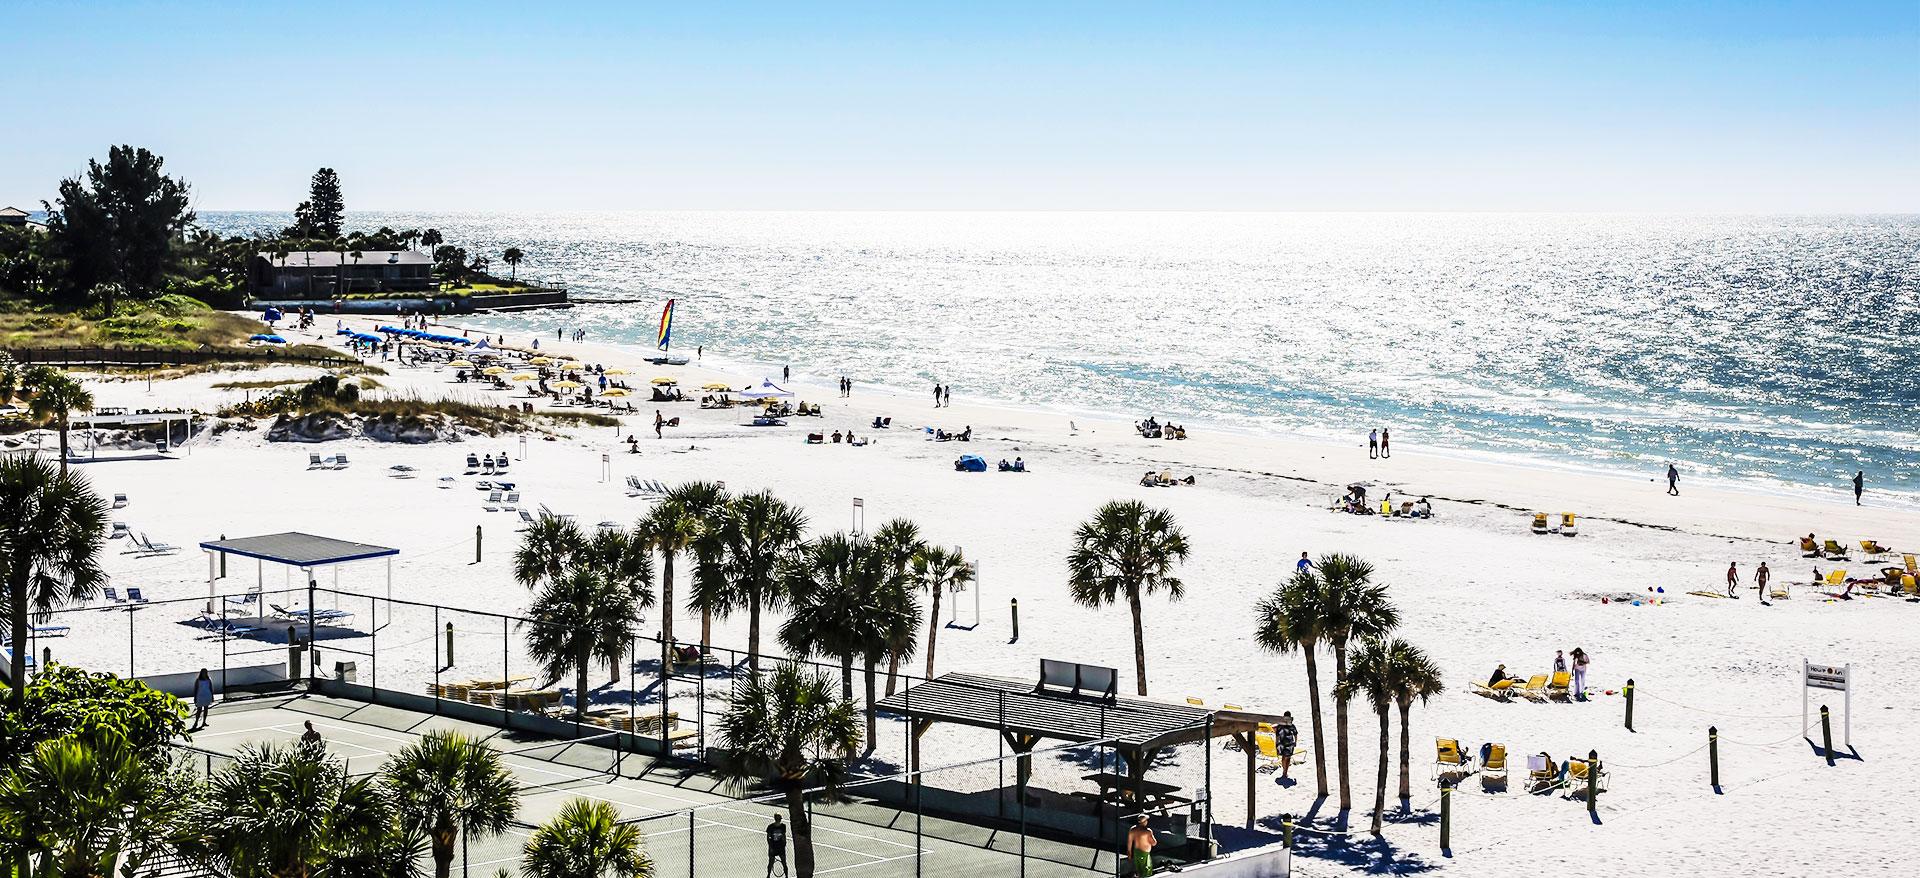 Things To Do at Sarasota, Florida